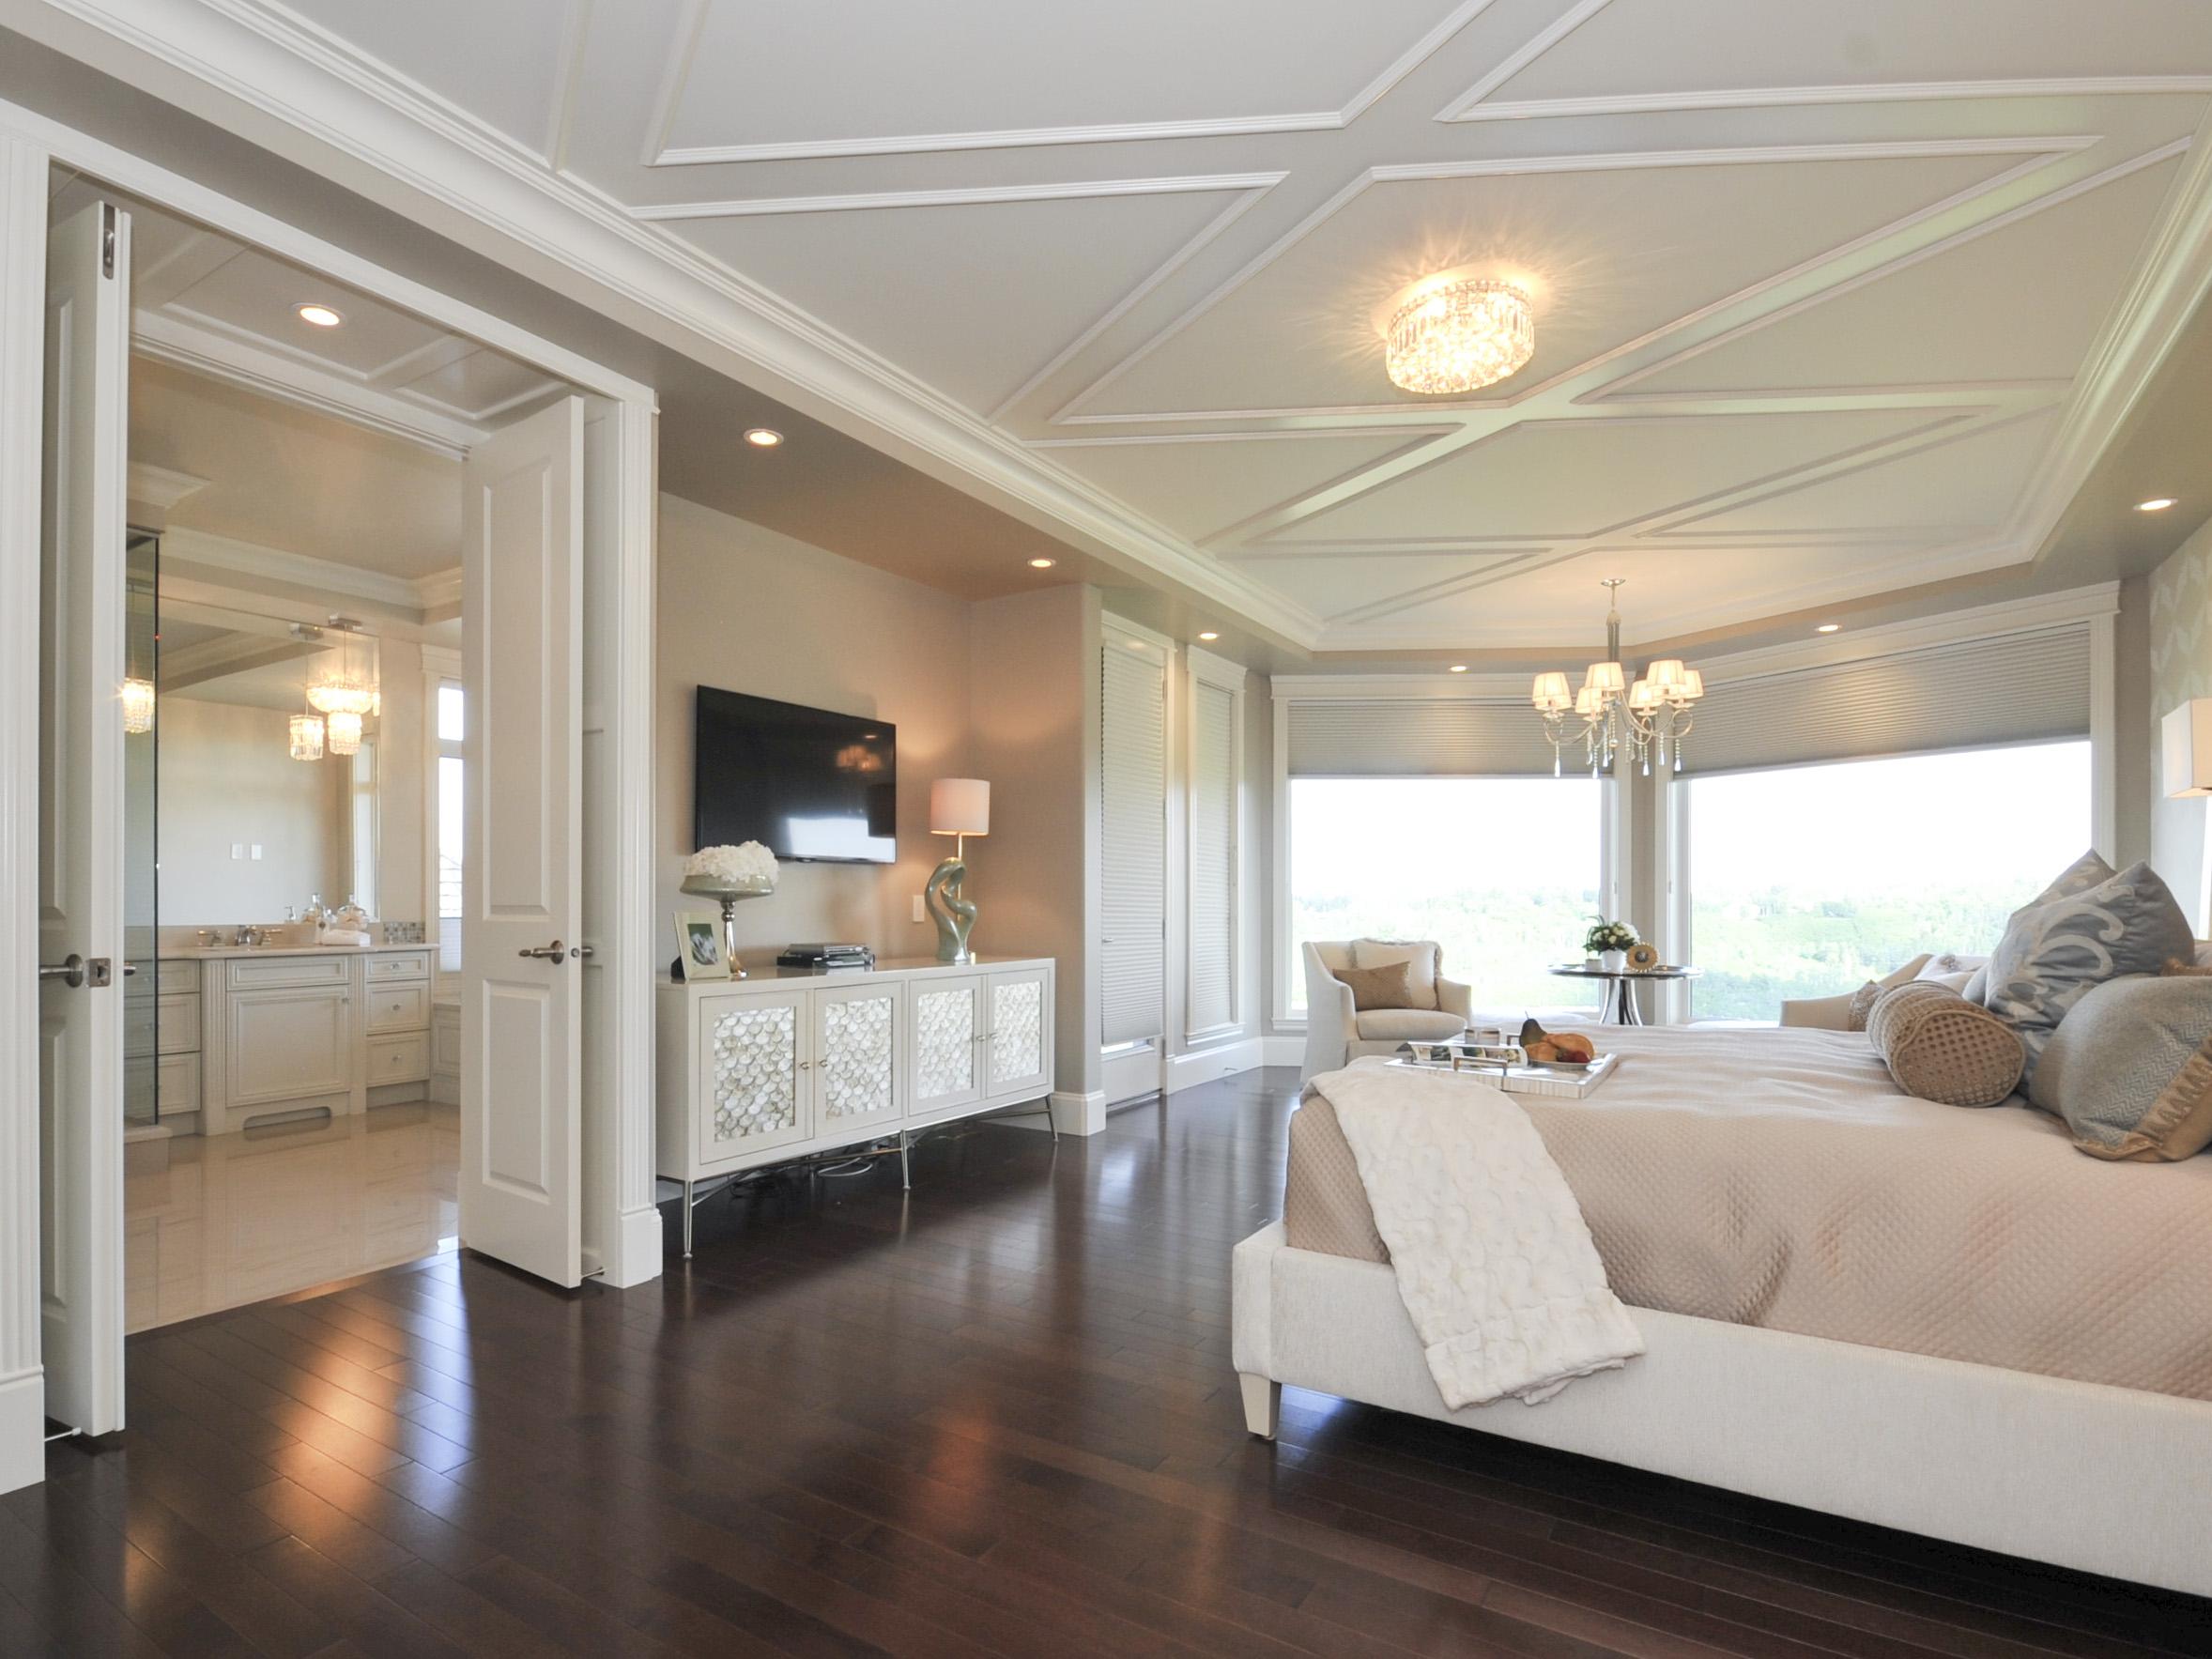 Interior Design For Home Edmonton AB